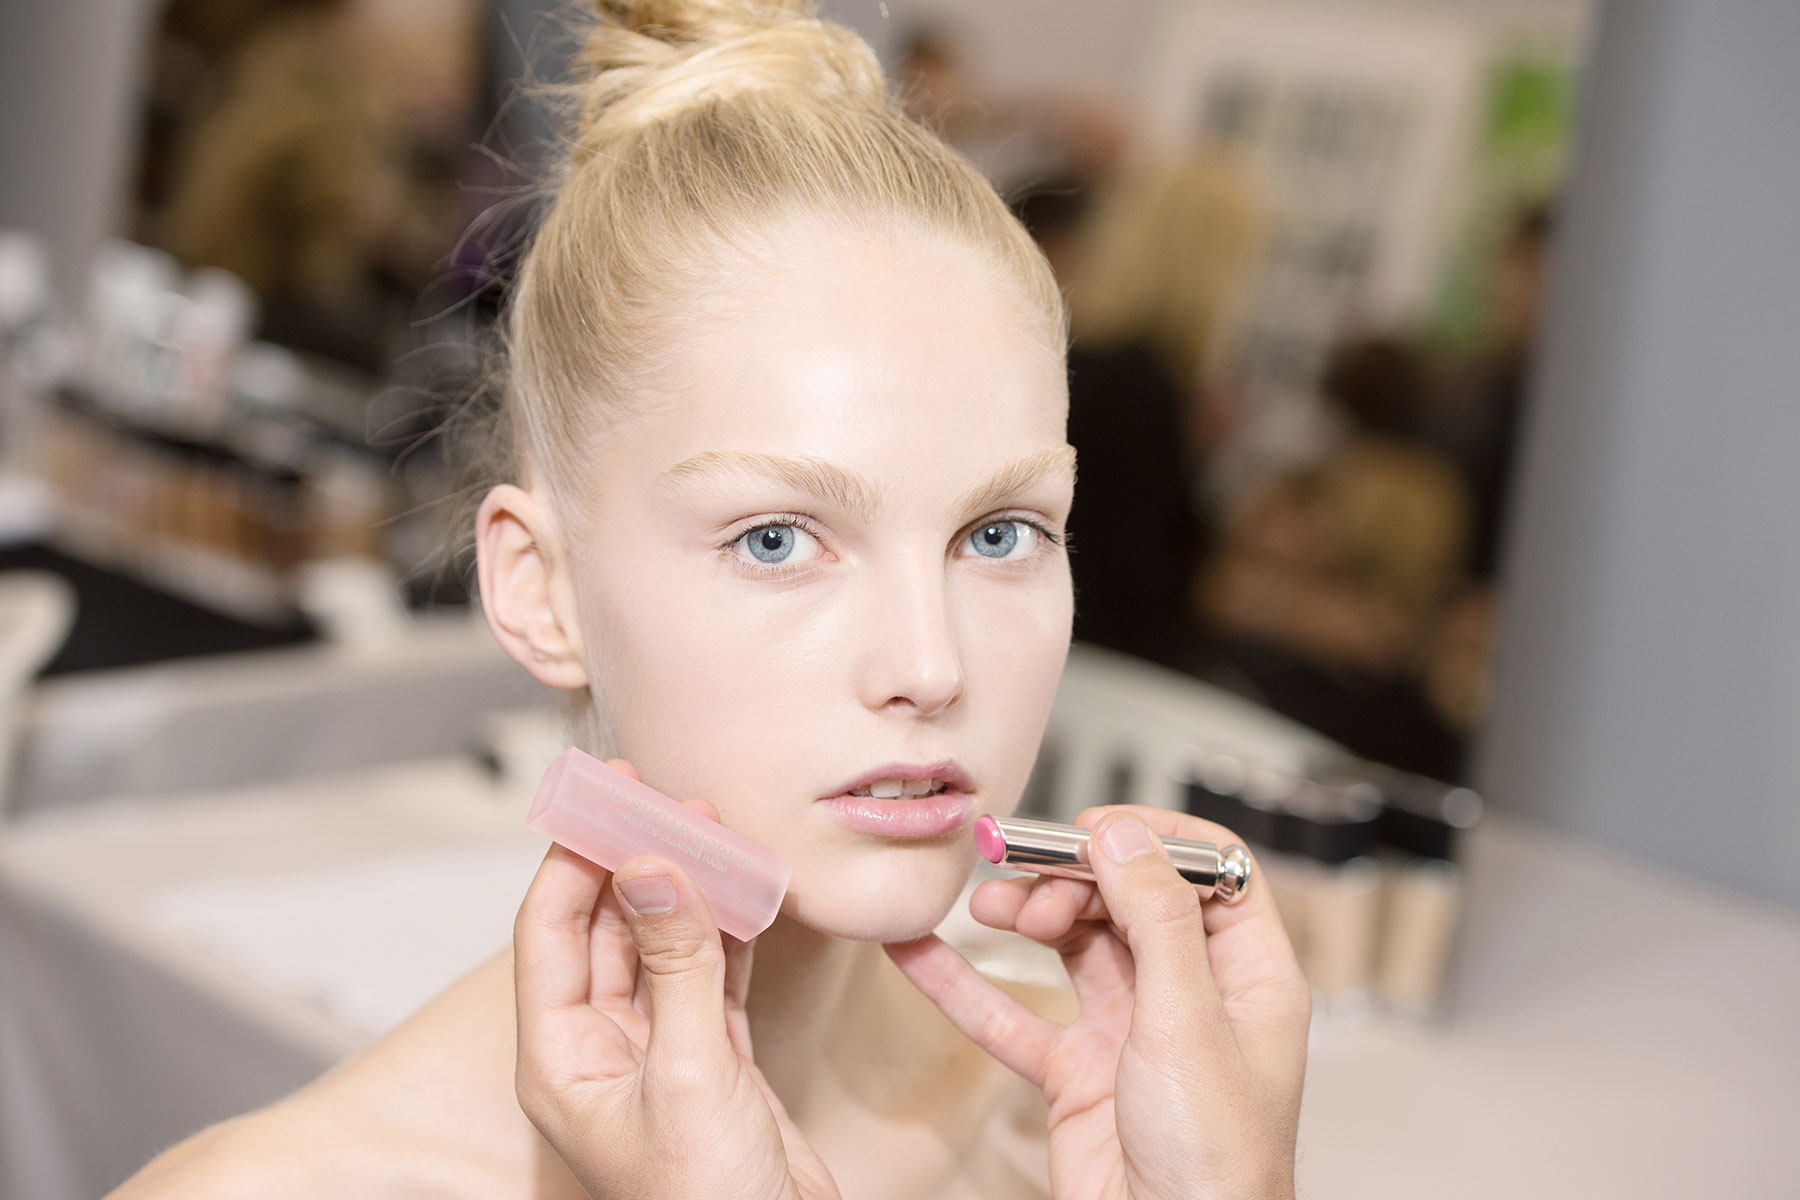 dior-makeup-sugar-scrub-spring-2017